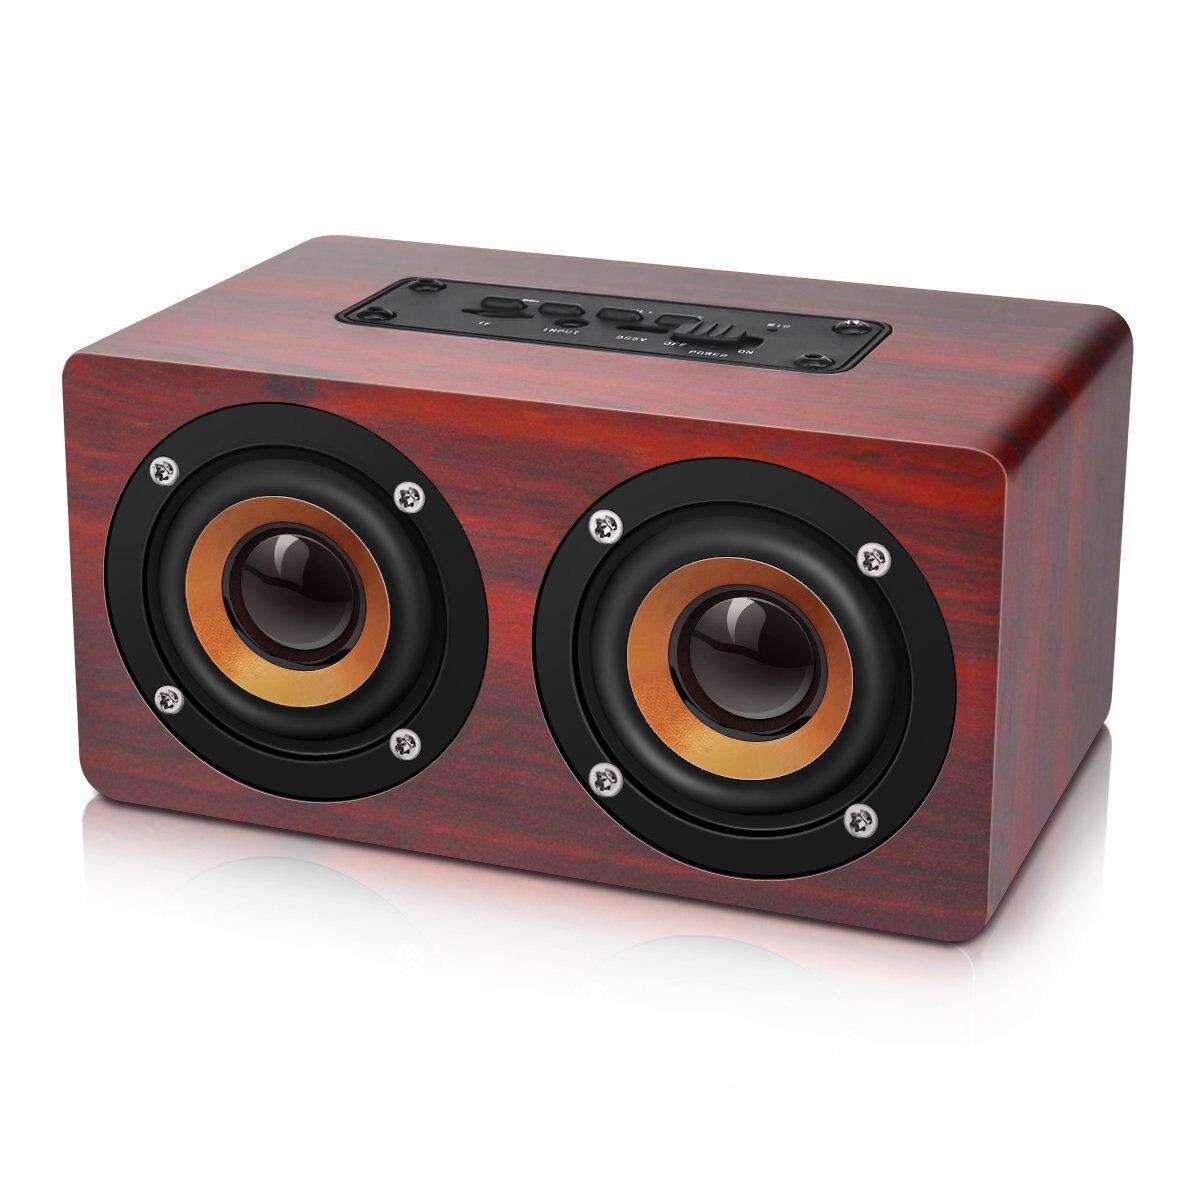 Retro Holz Bluetooth Lautsprecher HIFI Wireless Dual Lautsprecher 3D Surround Lautsprecher